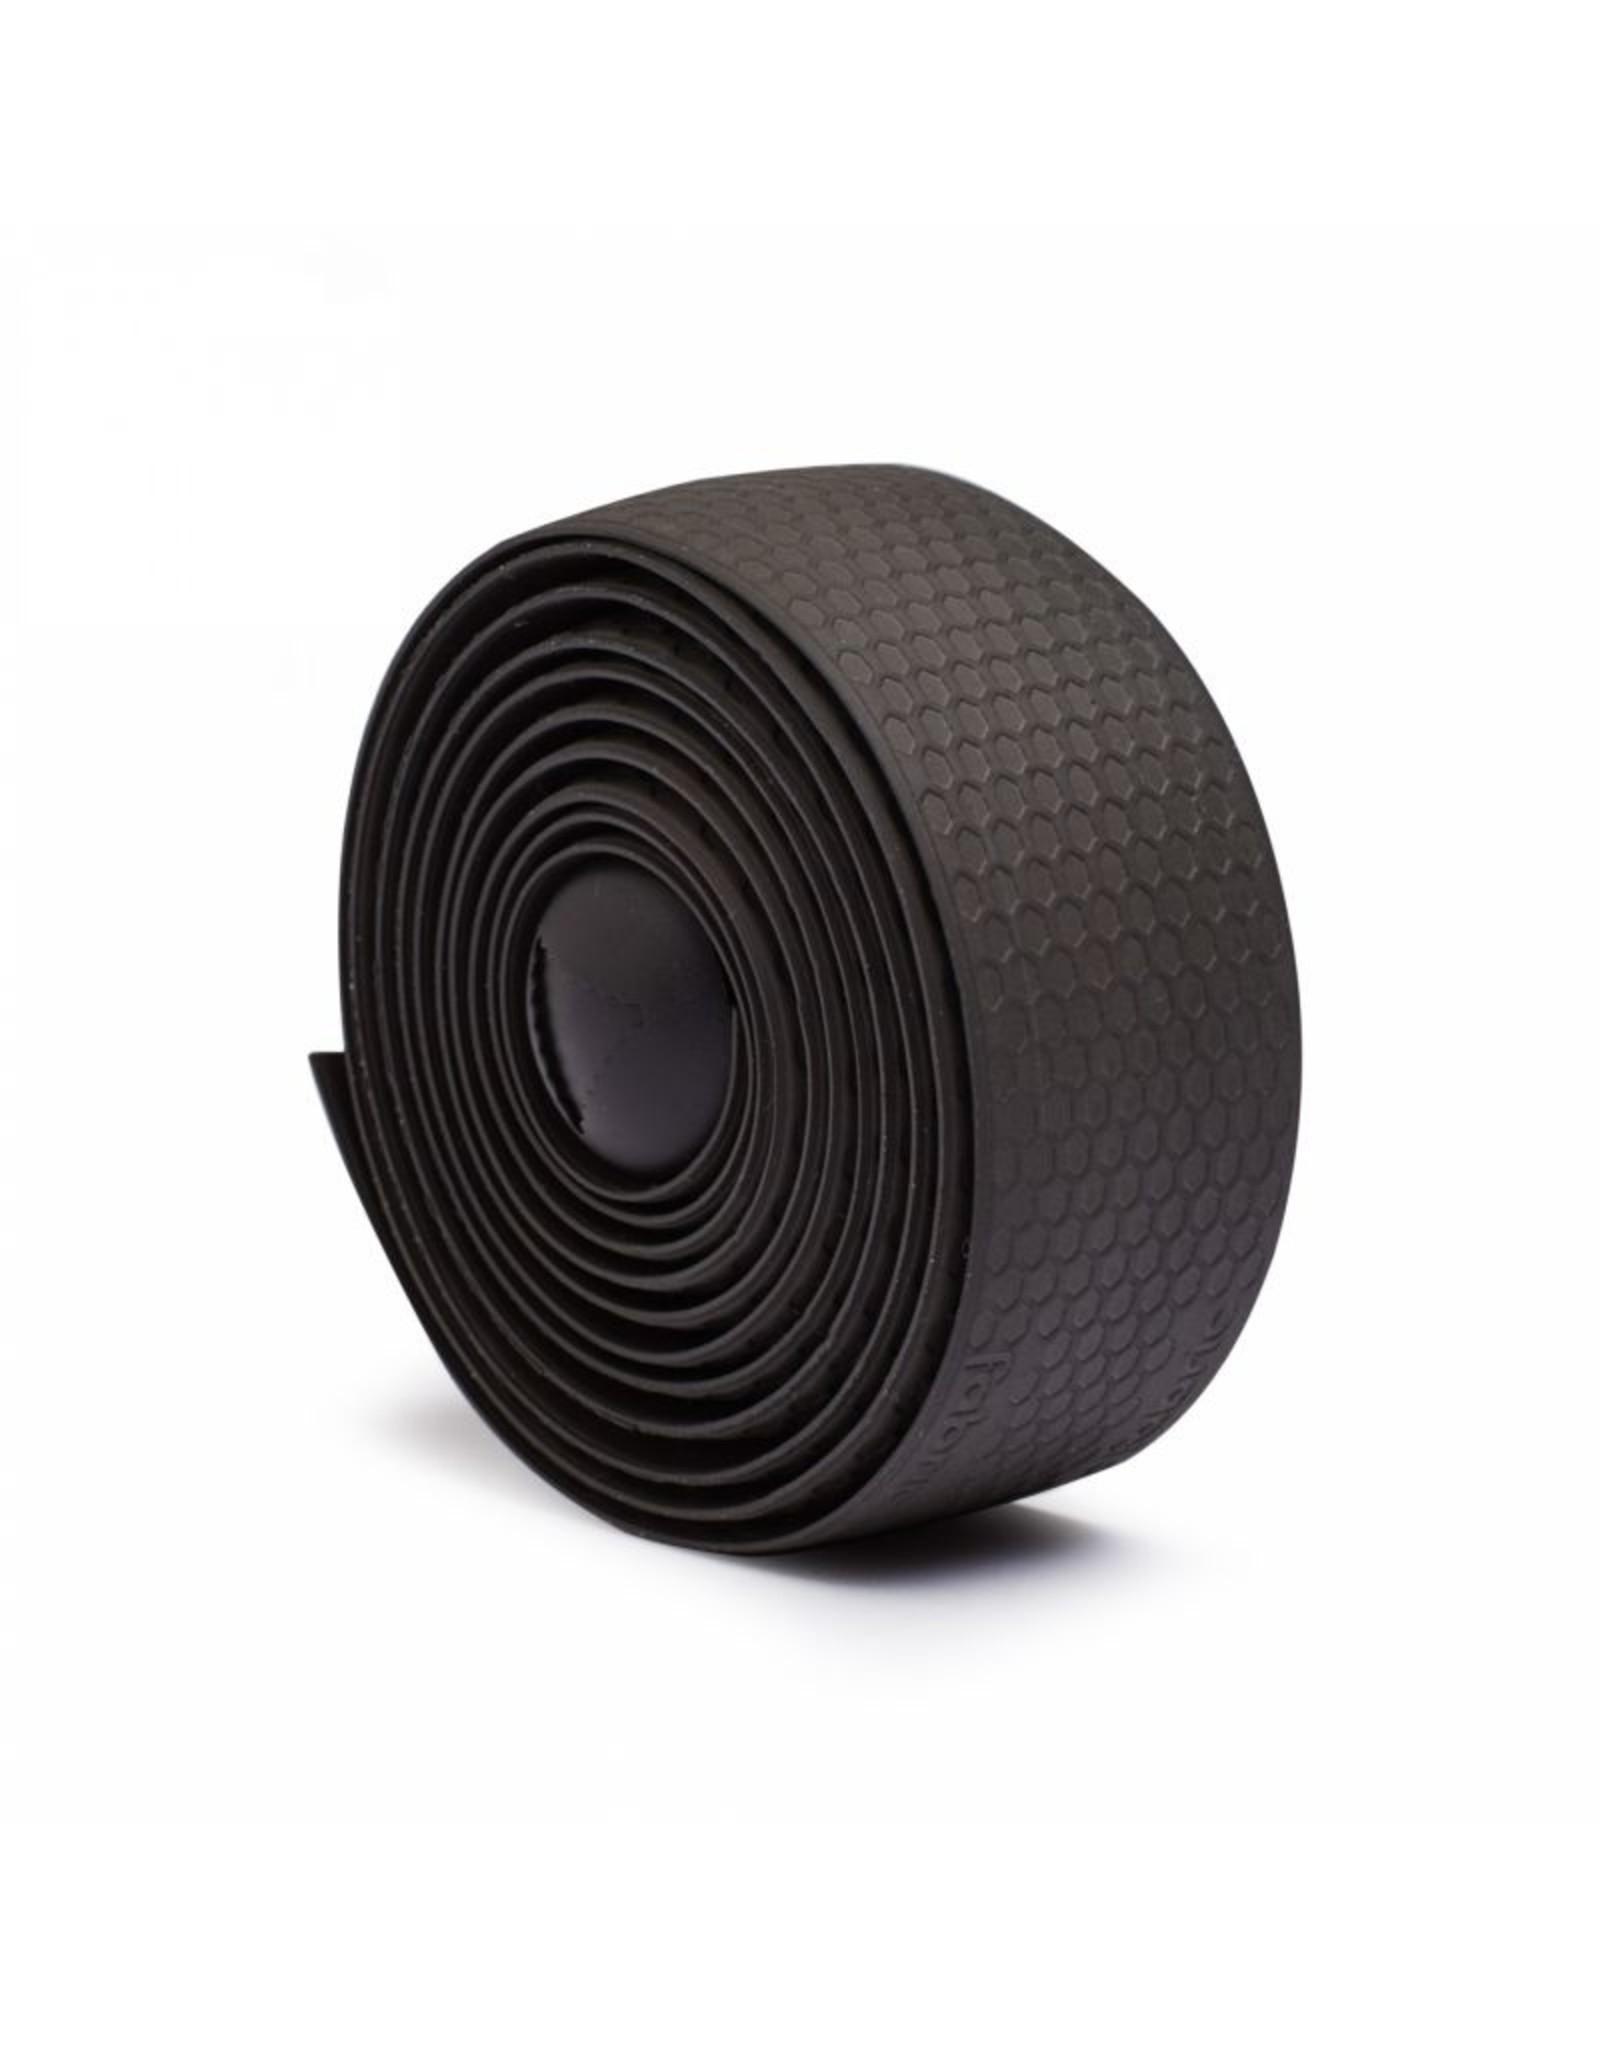 Fabric Ruban de guidon Fabric Silicone tape